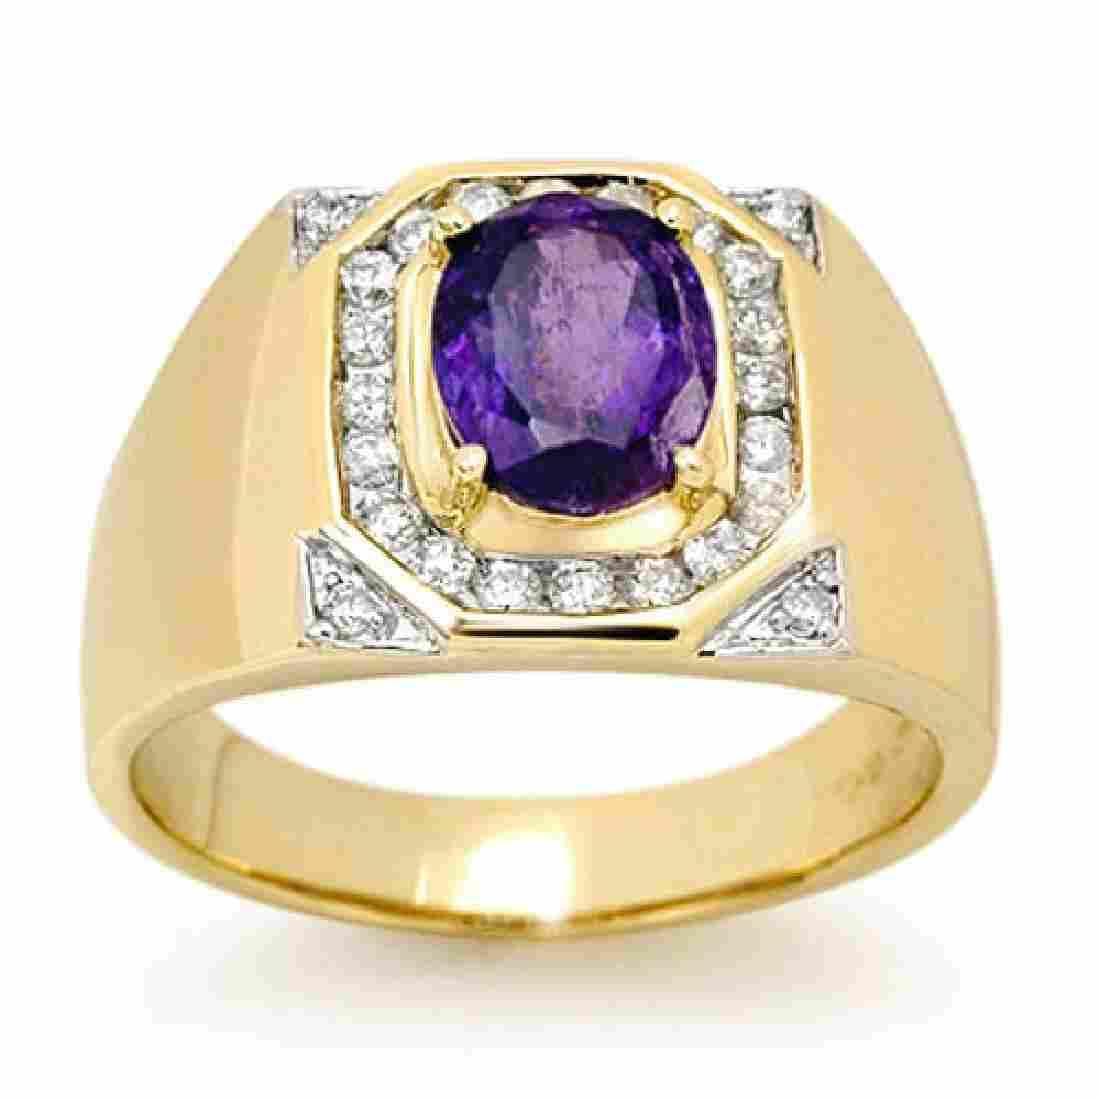 3.10 CTW Tanzanite & Diamond Men's Ring 14K Yellow Gold